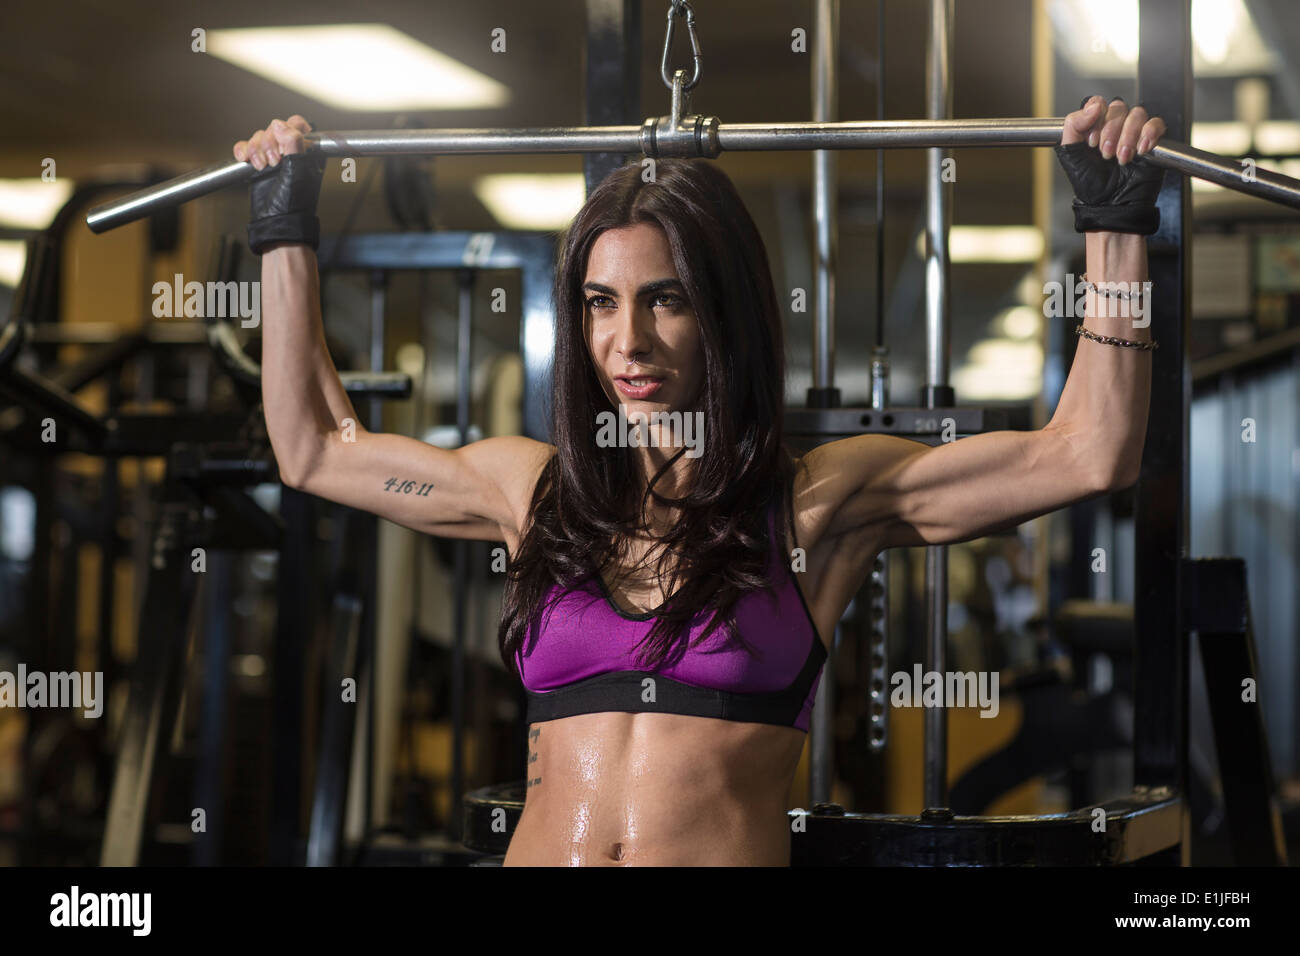 Mitte Erwachsene Frau mit bar im Fitness-Studio für Brust-Übung Stockbild